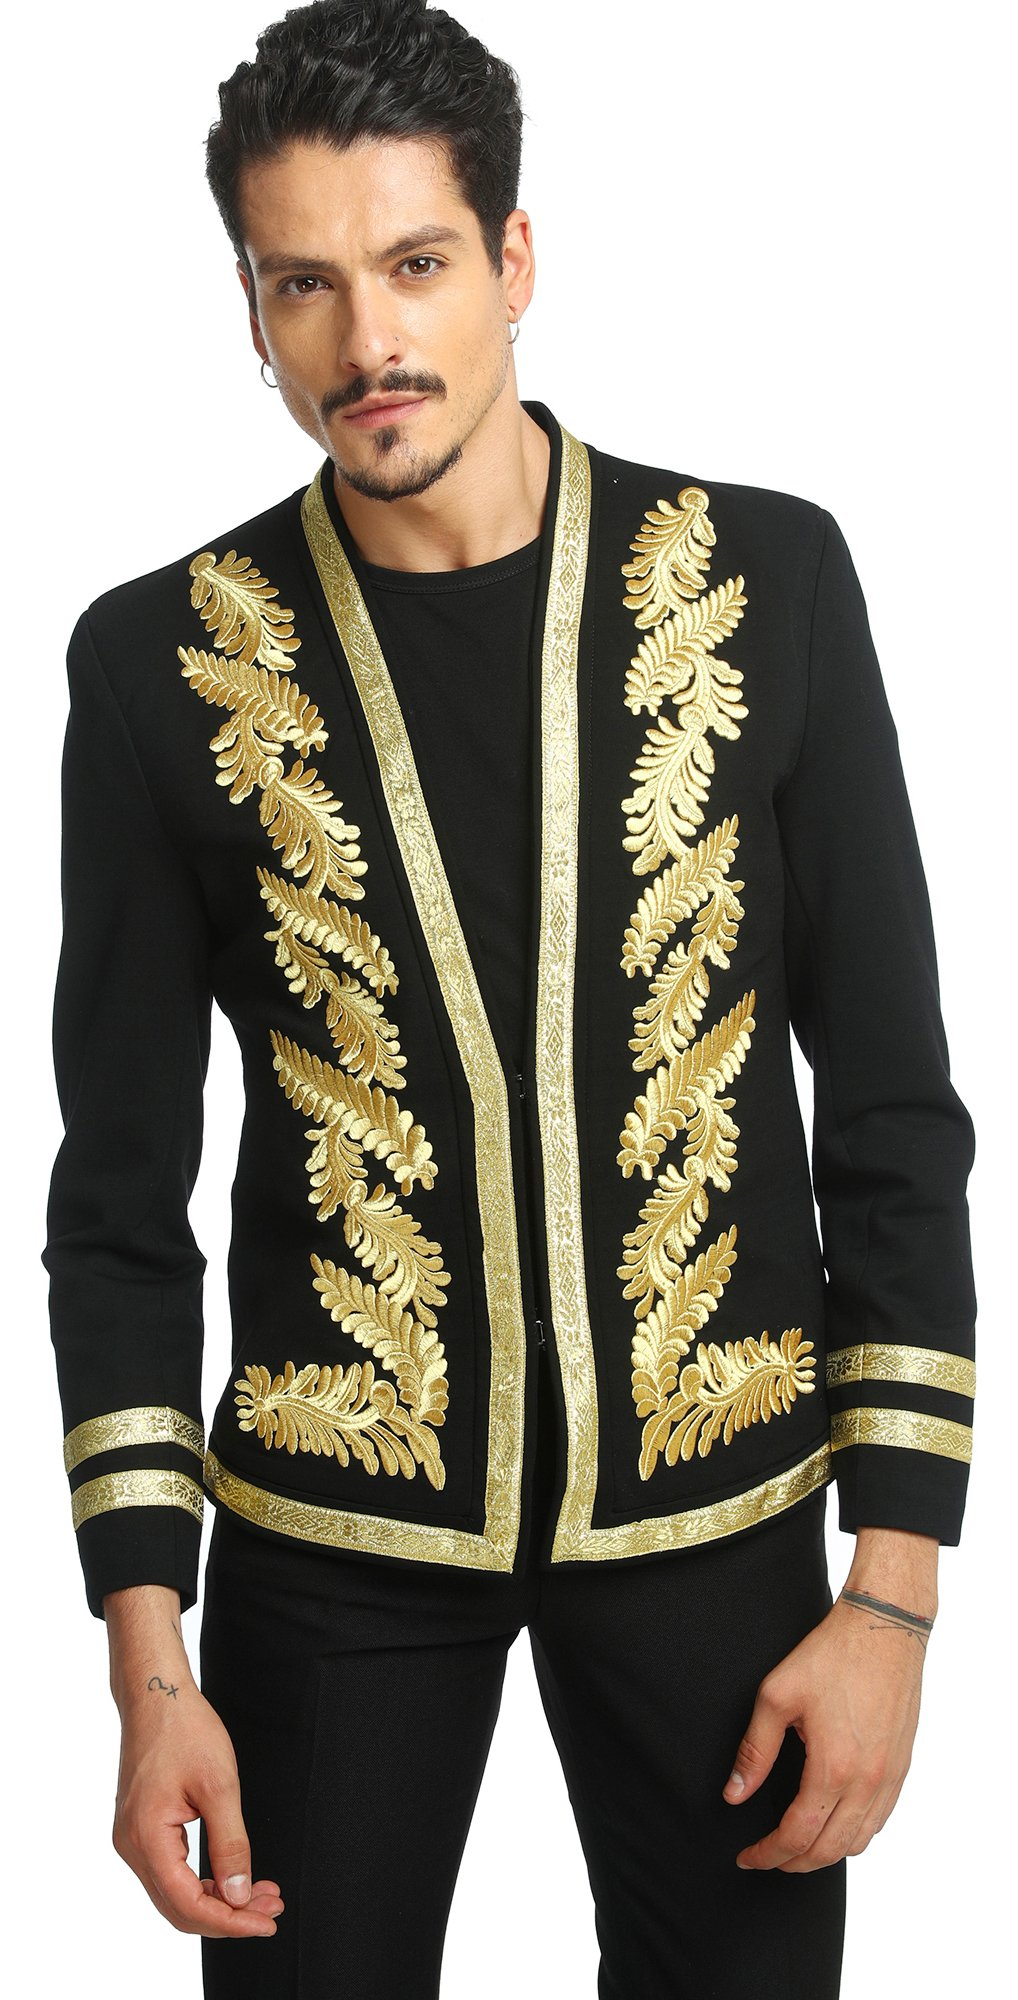 Pizoff Men's Luxury V-Neck Slim Fit Stylish Suit Blazer Jacket Long Sleeve Formal Dinner Dress AD001-10-L